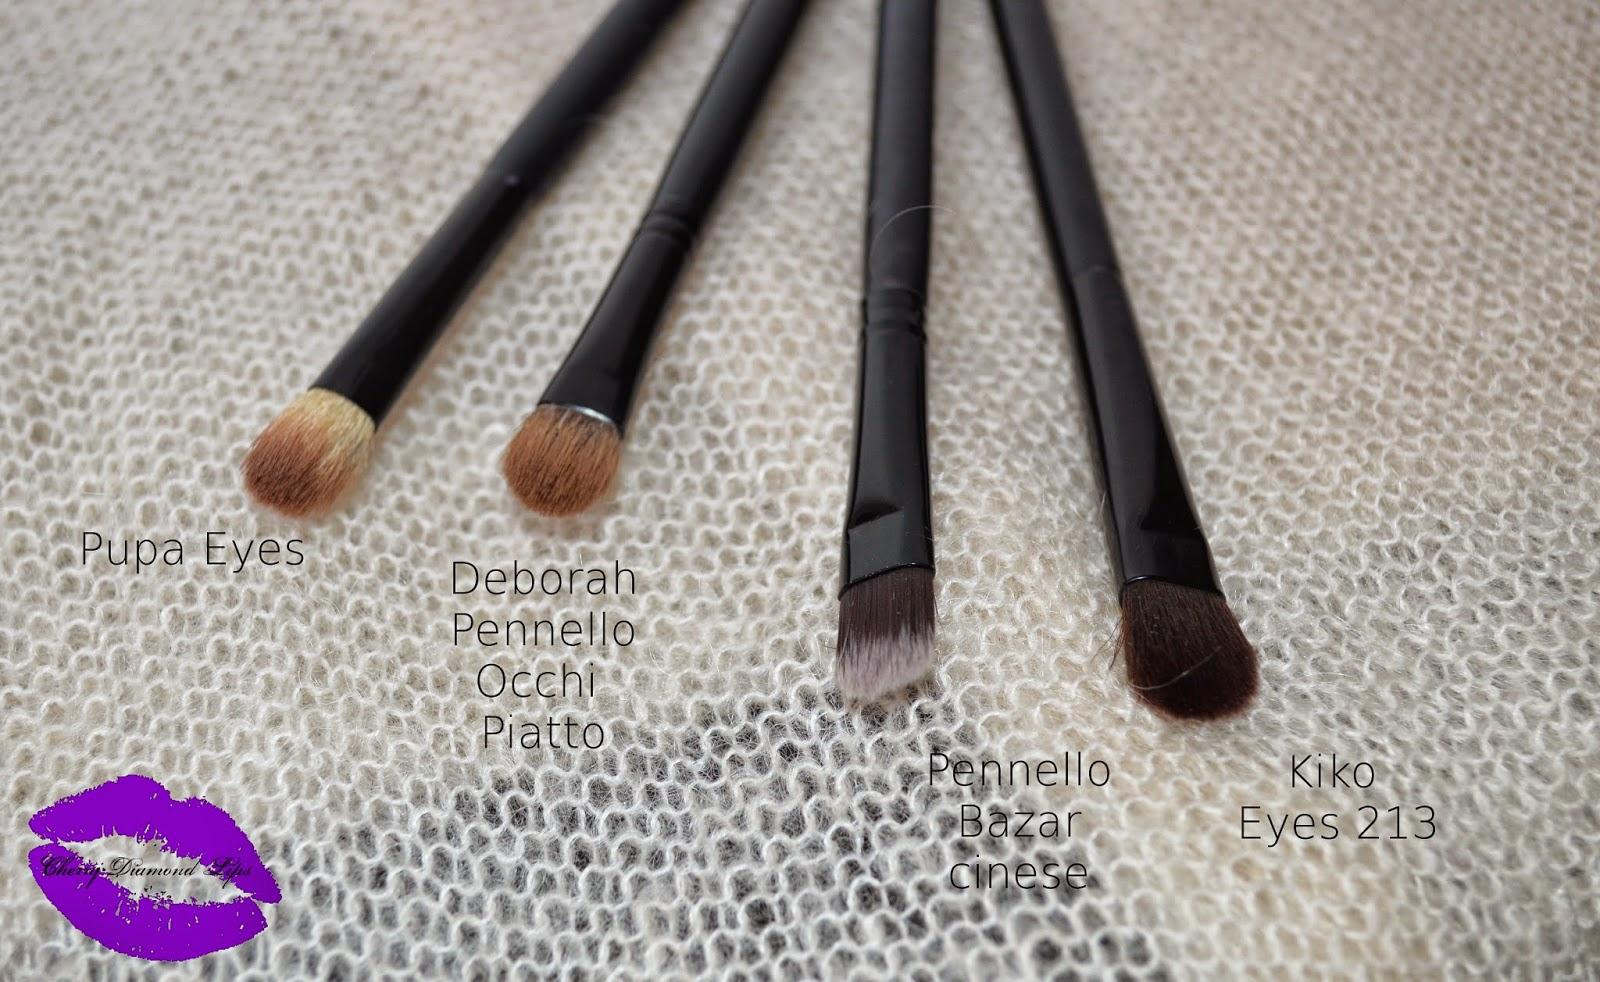 Pennelli, Brush, Revlon, Pupa, Deborah, Essence, Smoky, Hakuro, H77, H67, H74, Pulizia Pennelli, Rae Morris, Cherry Diamond Lips Make-up